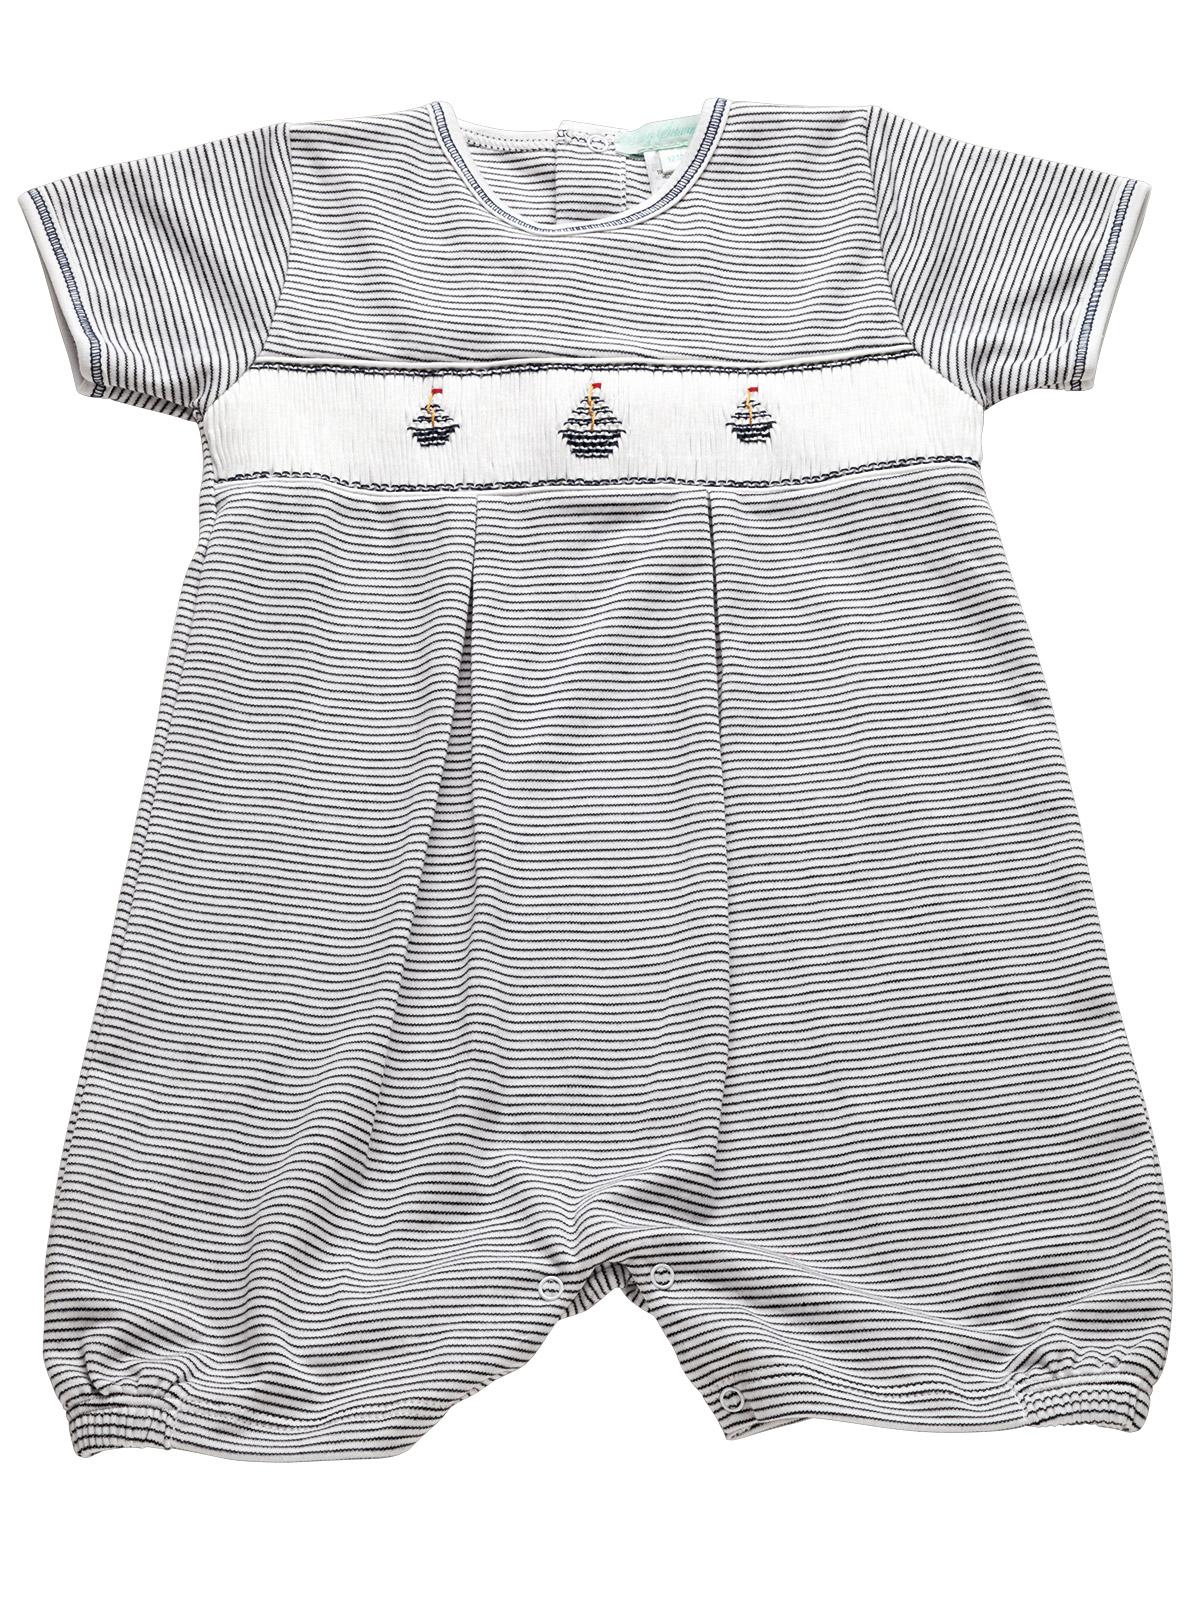 Baby-Romper_Riley-Sail-Gray_4797.jpg